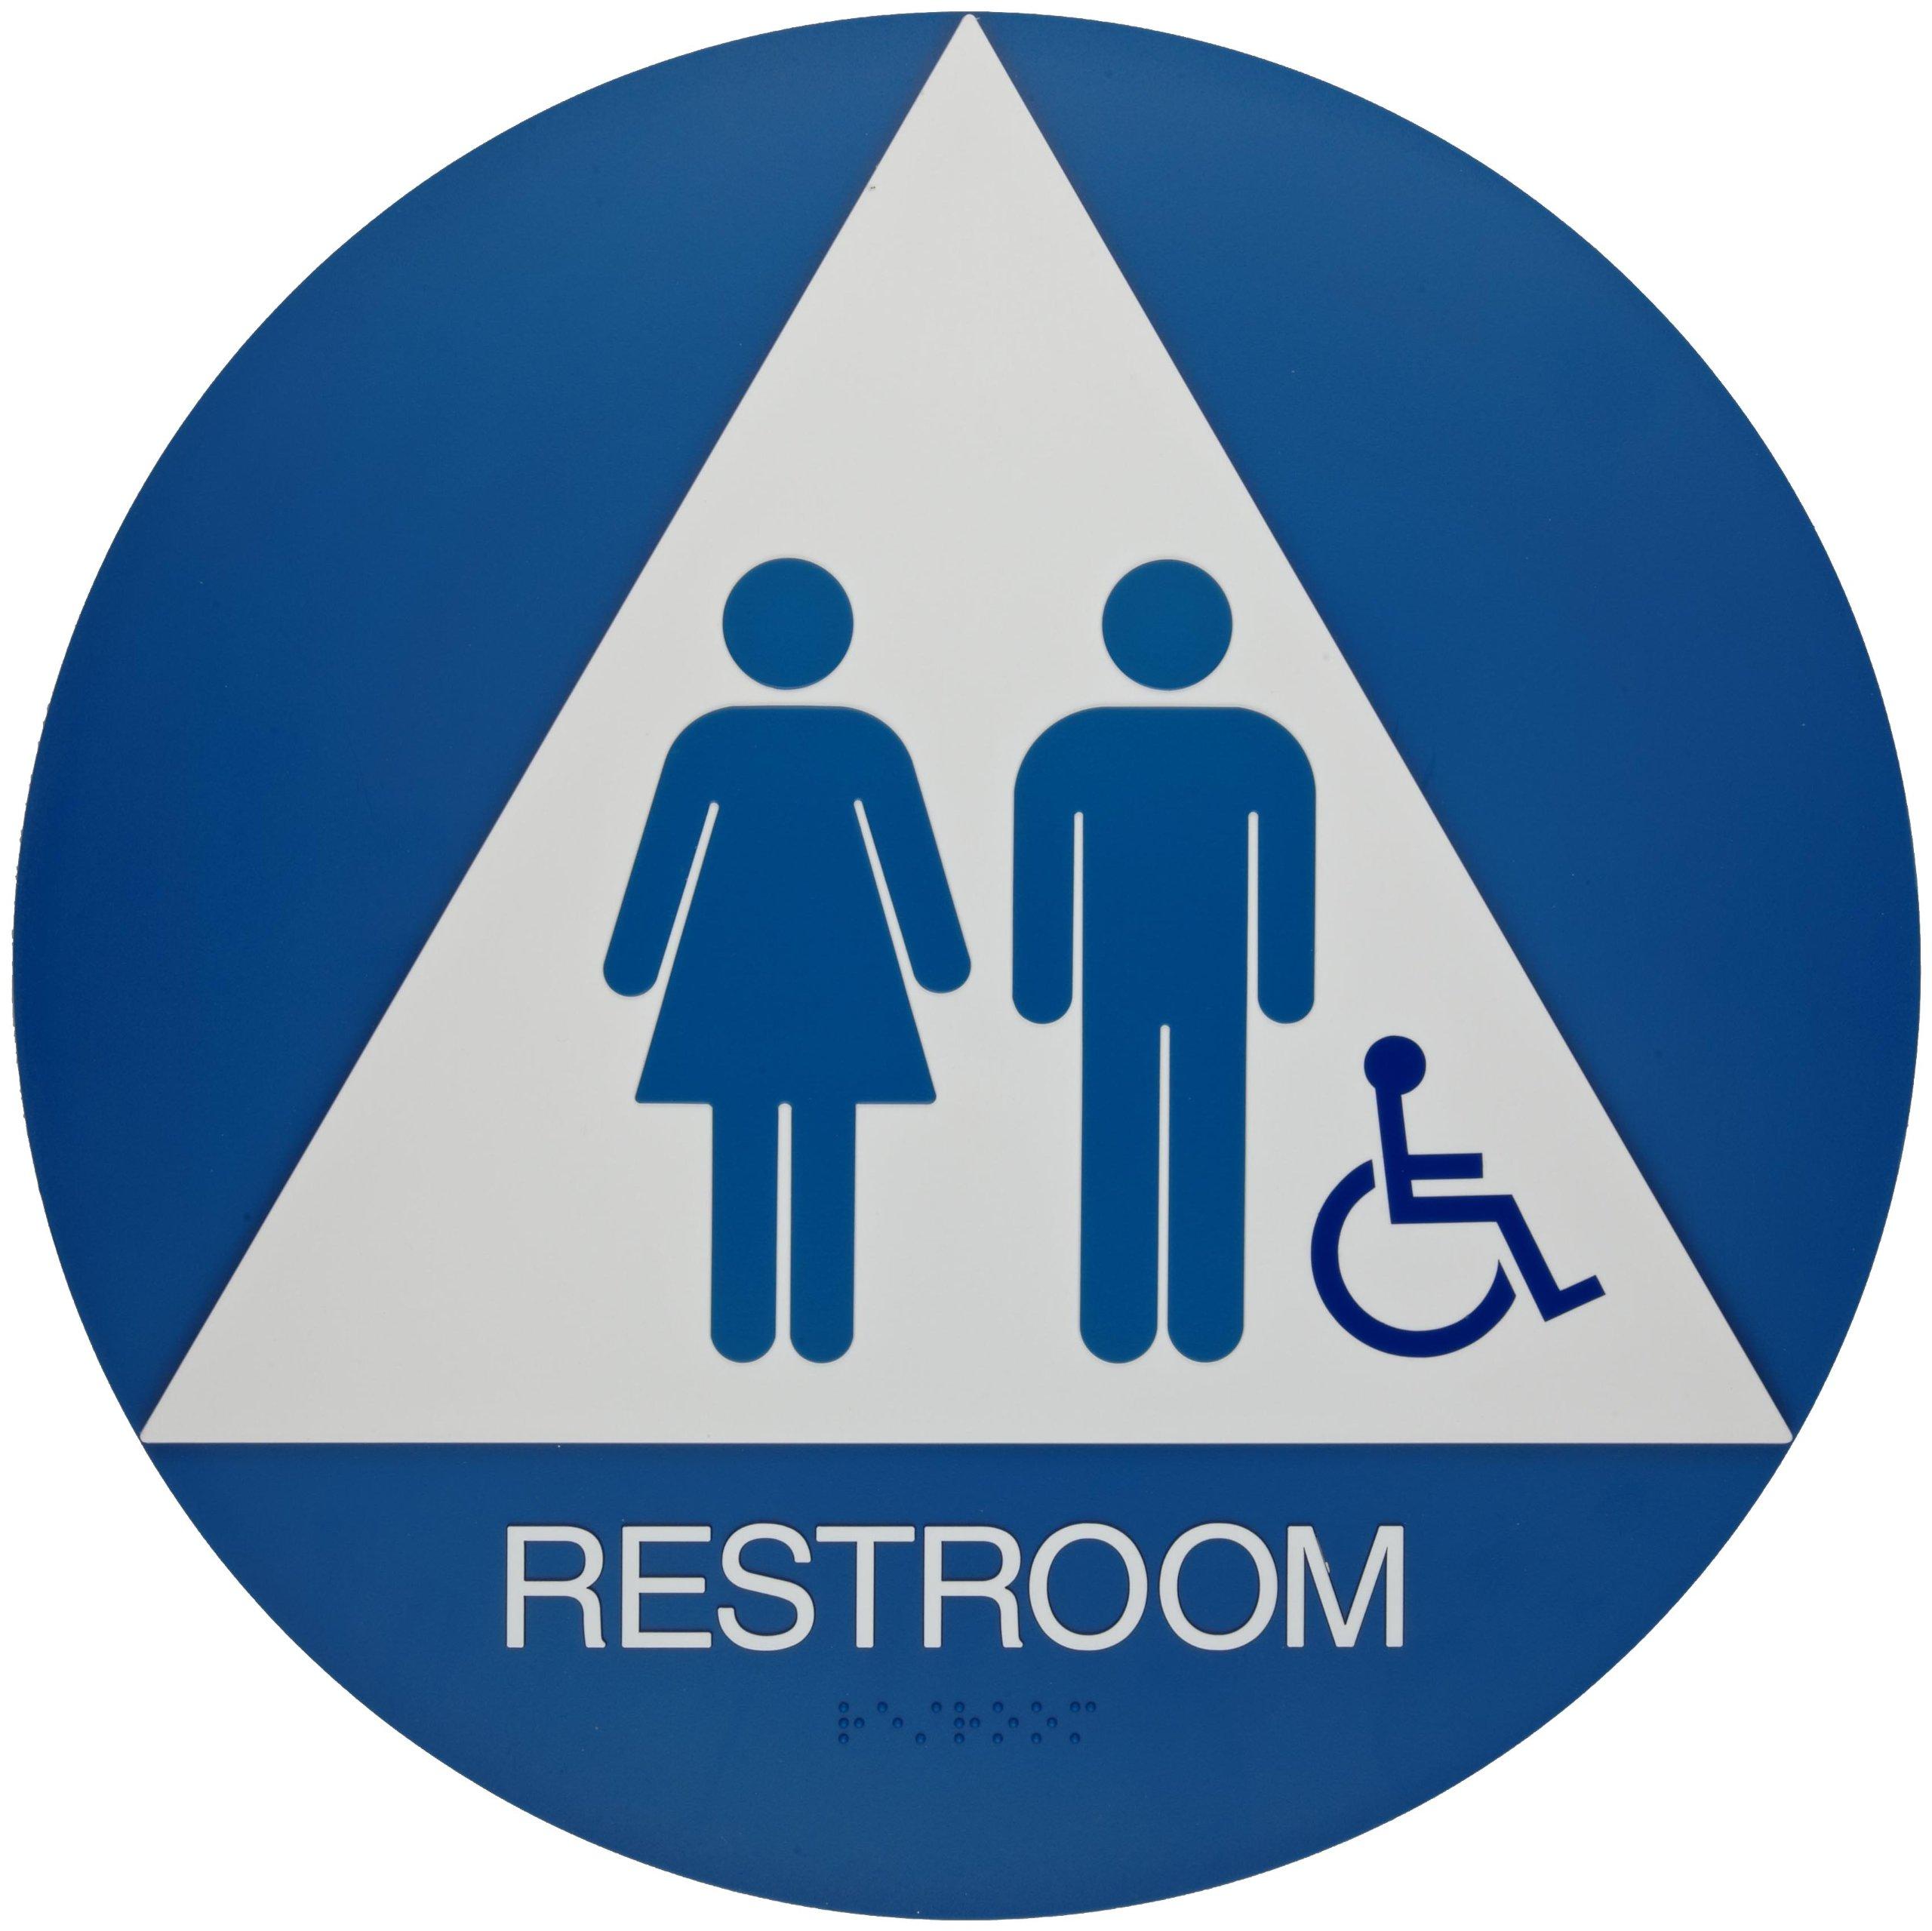 Brady California/ADA Restroom Sign,  Legend ''Restroom'' - Plastic, White on Blue, 12'' Diameter - 106184